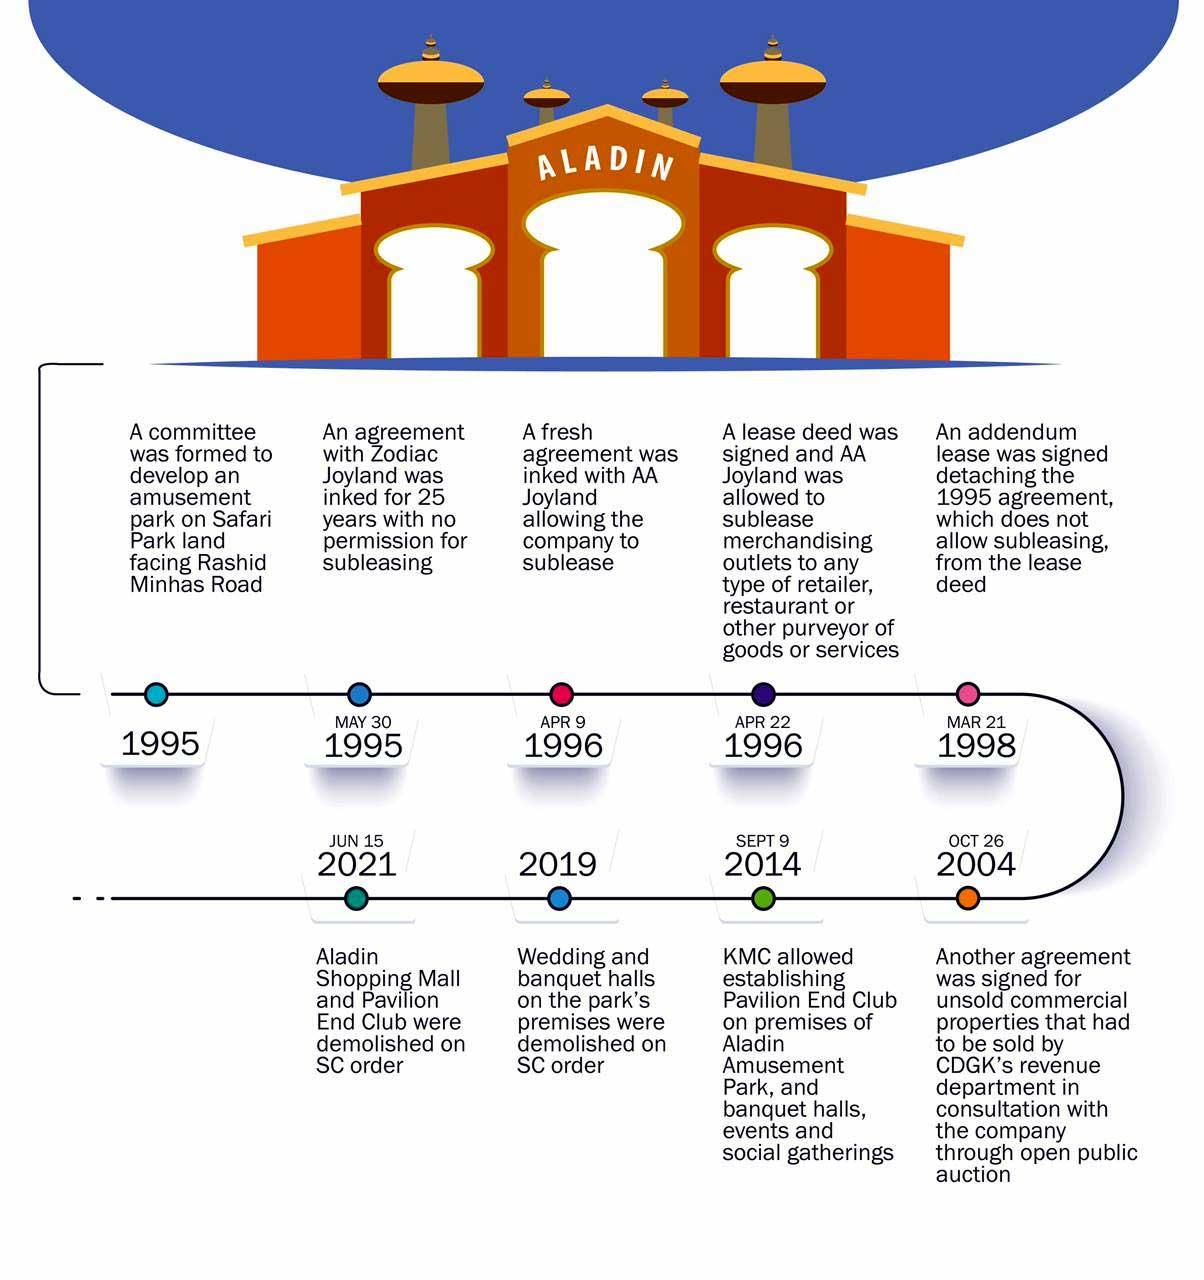 Infographic by Faraz Maqbool.